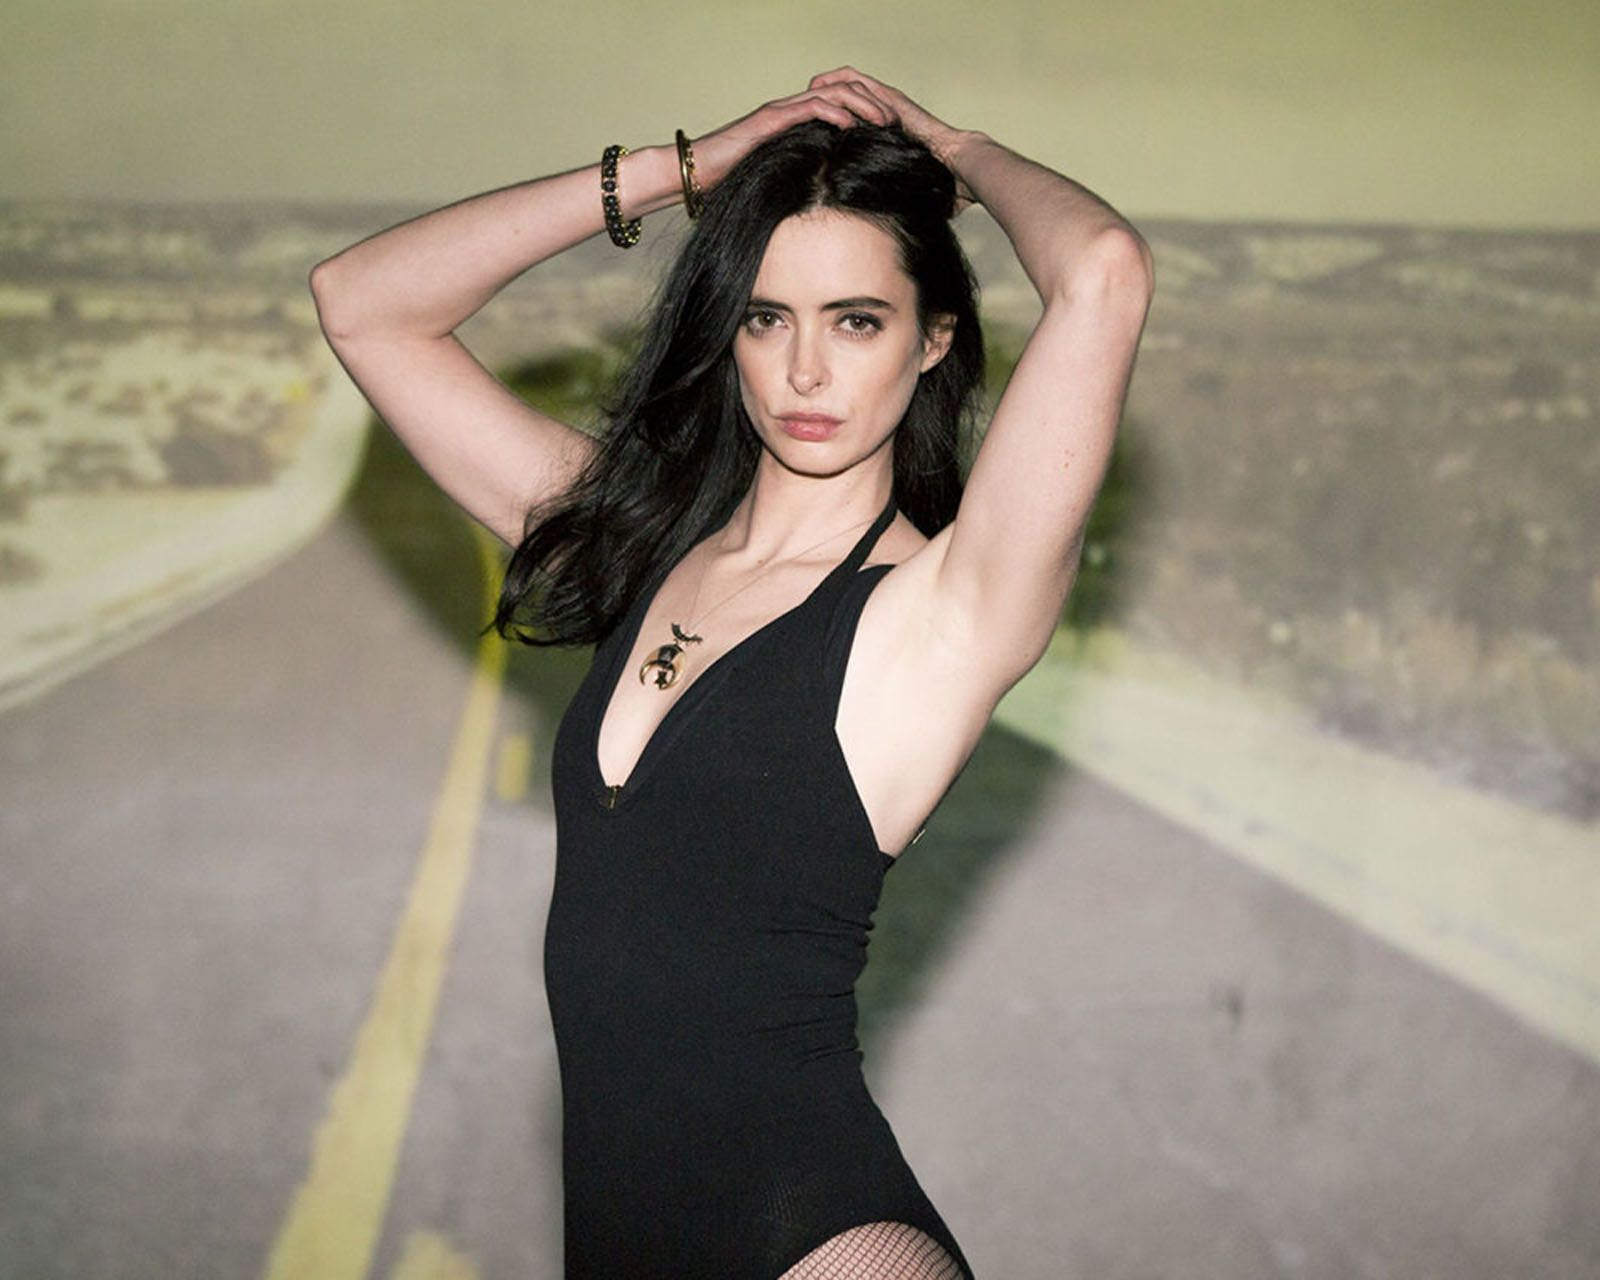 Chloe vevrier nude pics